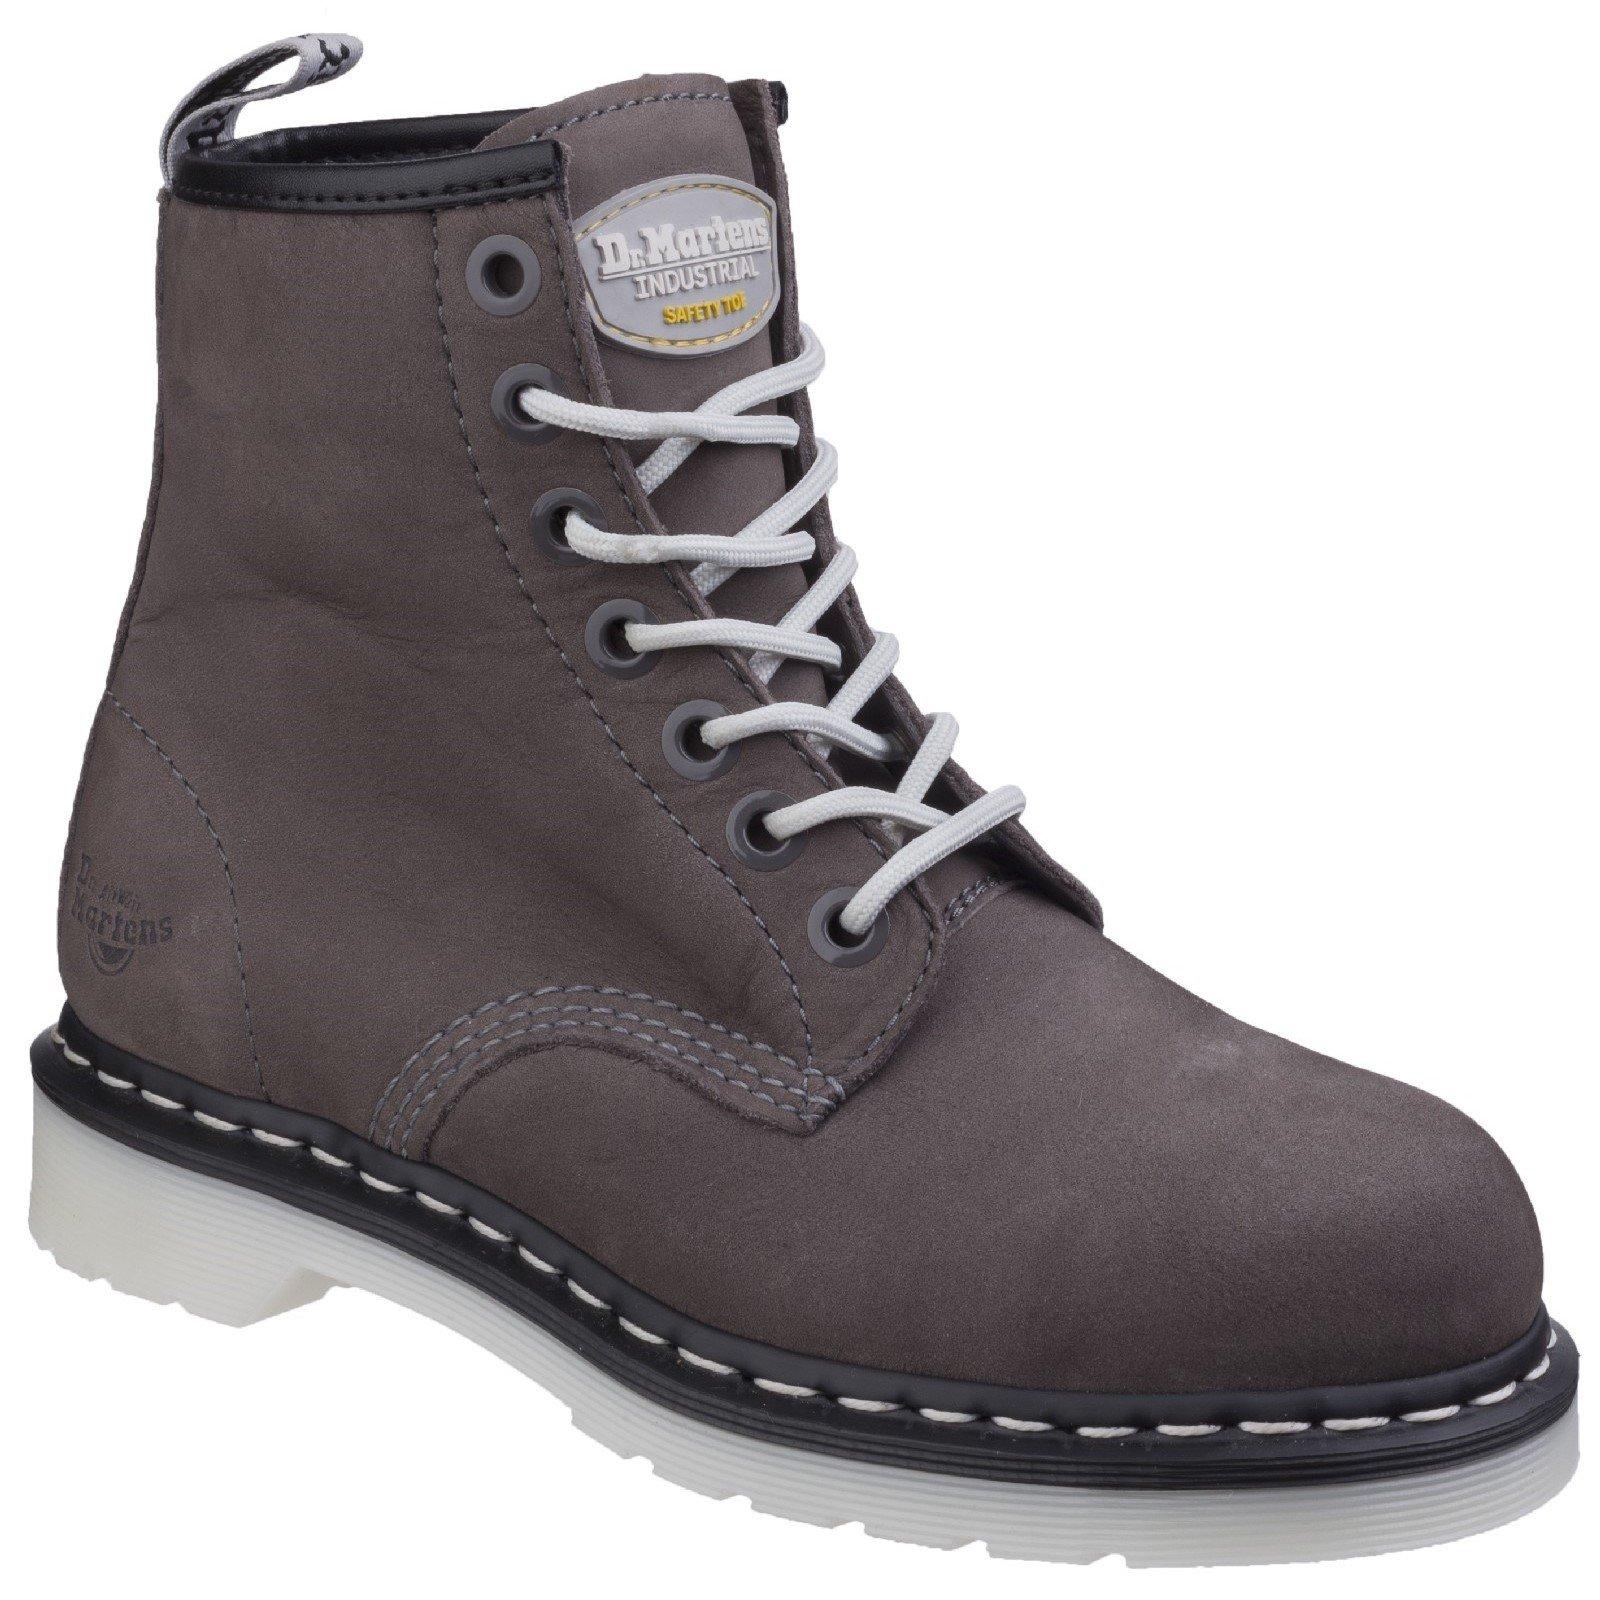 Dr Martens Women's Maple Classic Steel-Toe Work Boot Grey 26783 - Grey Wind River 7